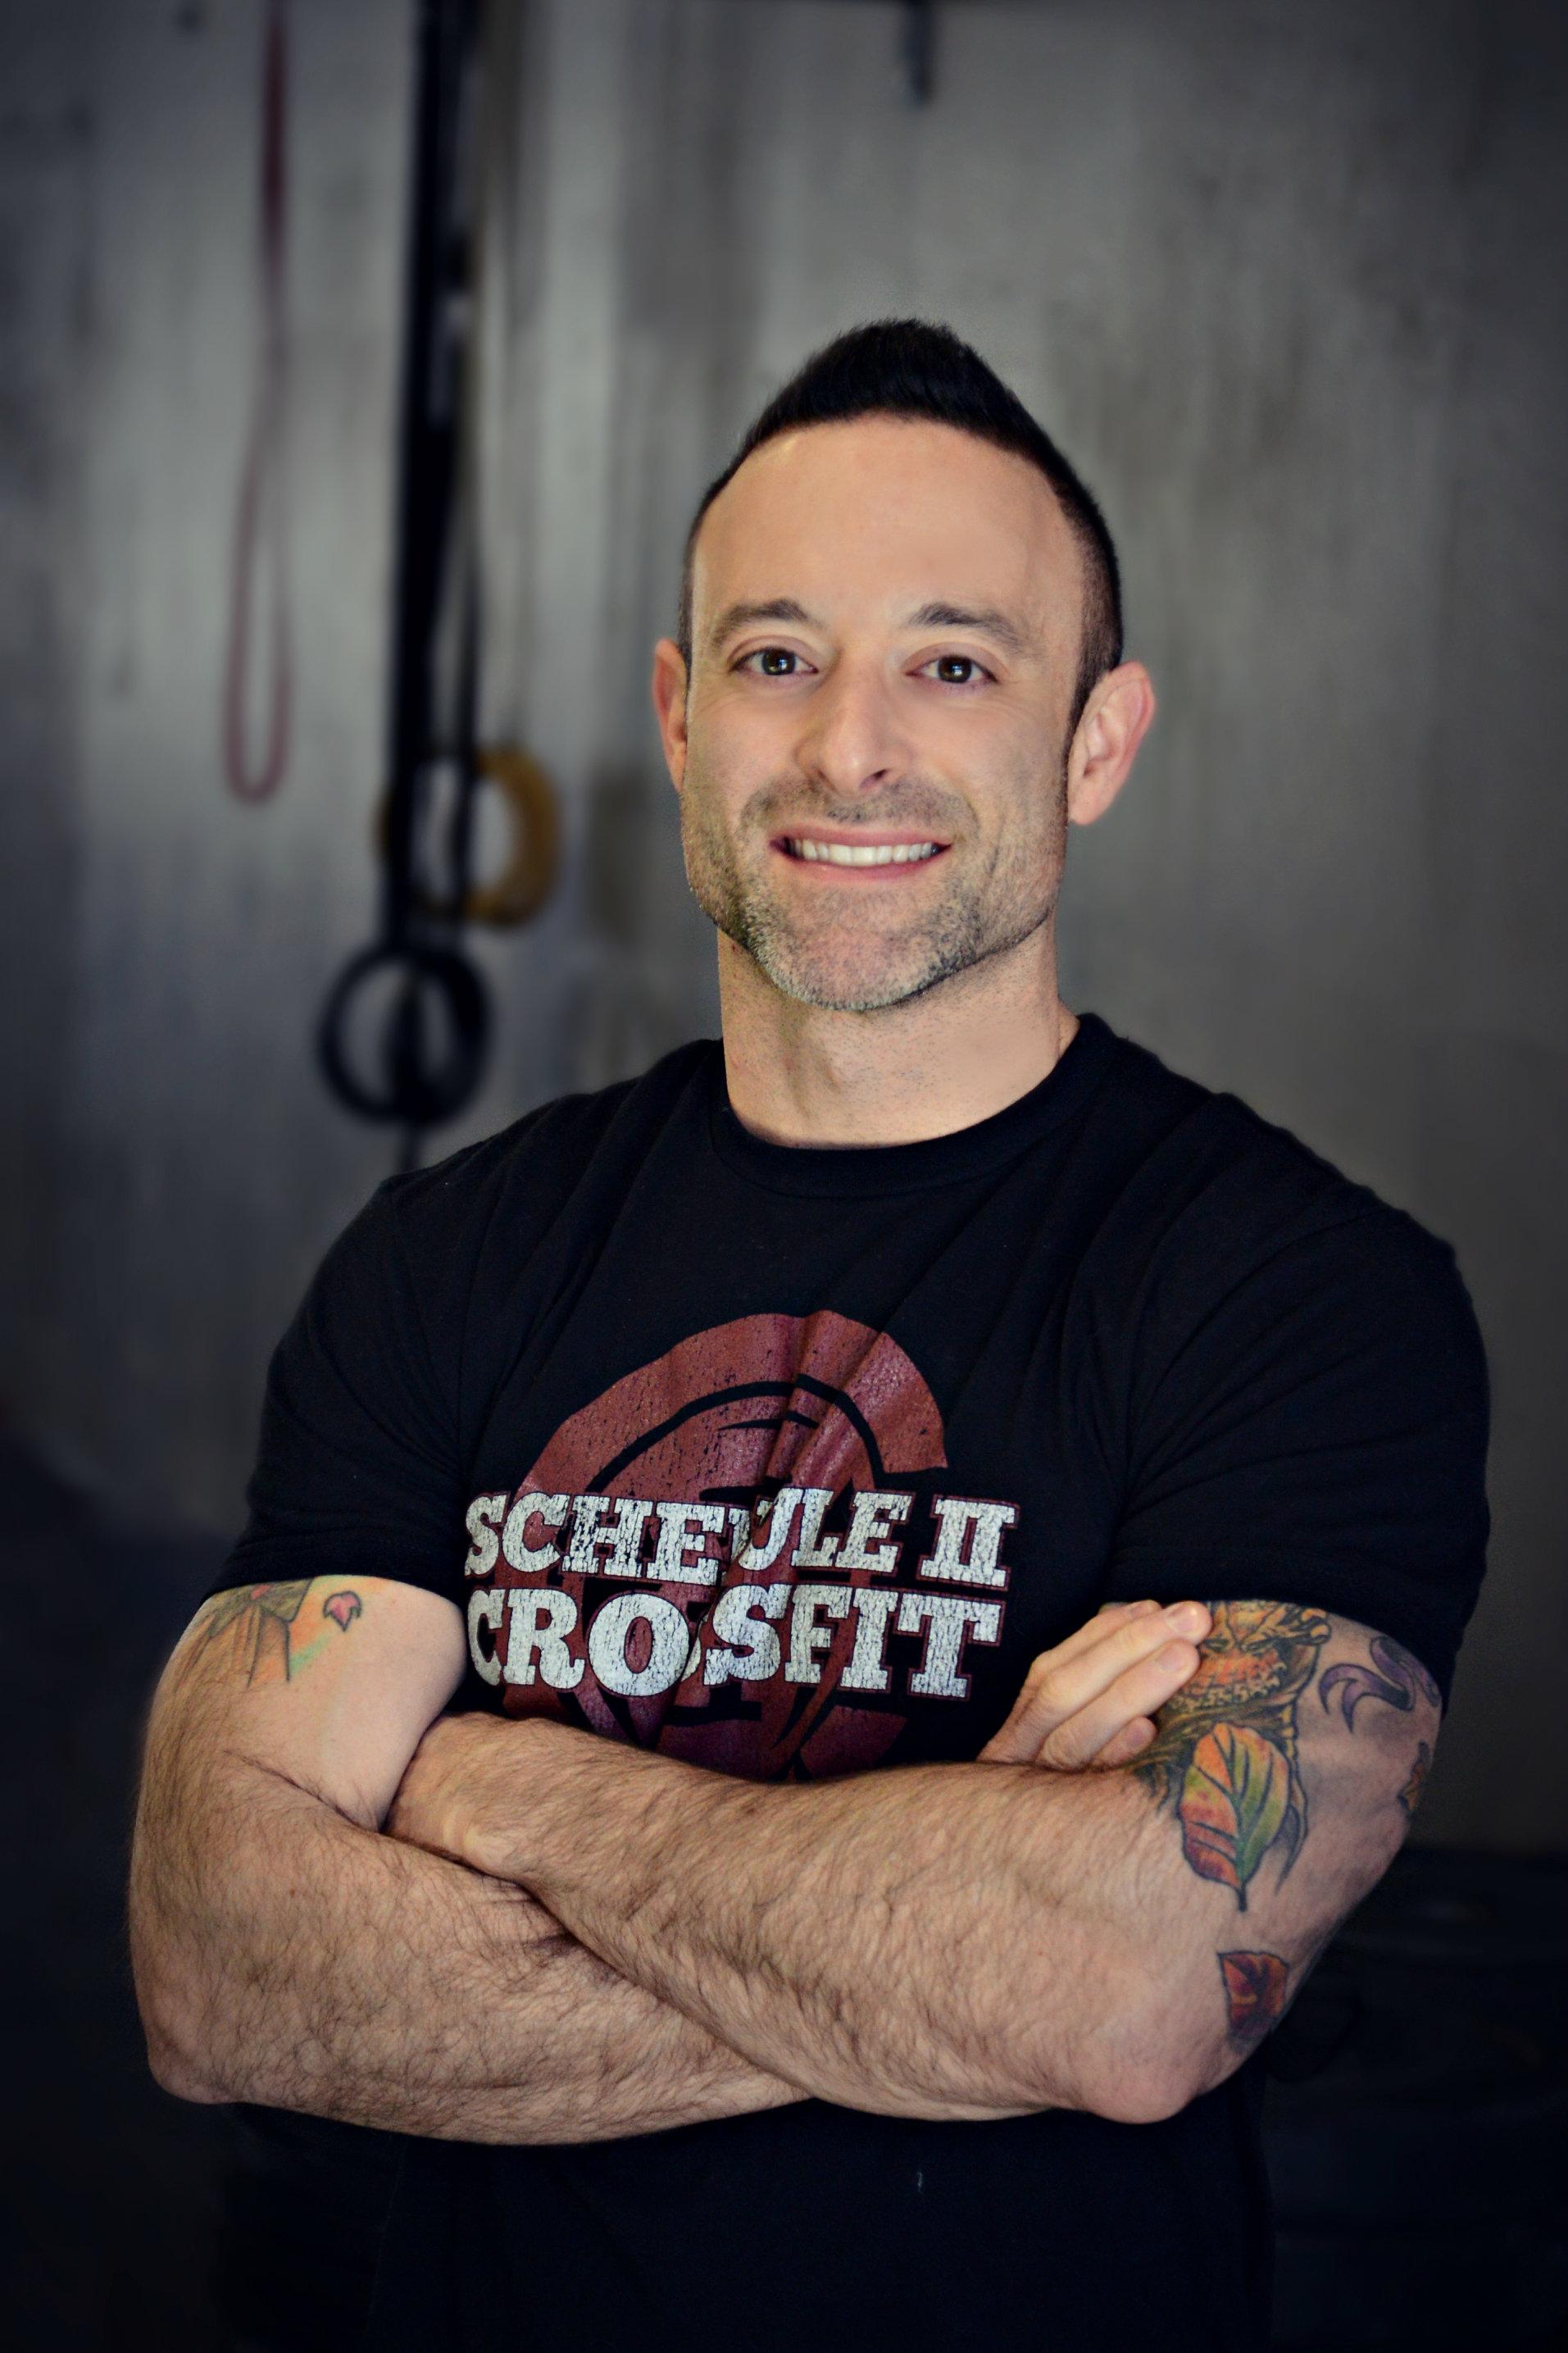 Bryan Polsonetti